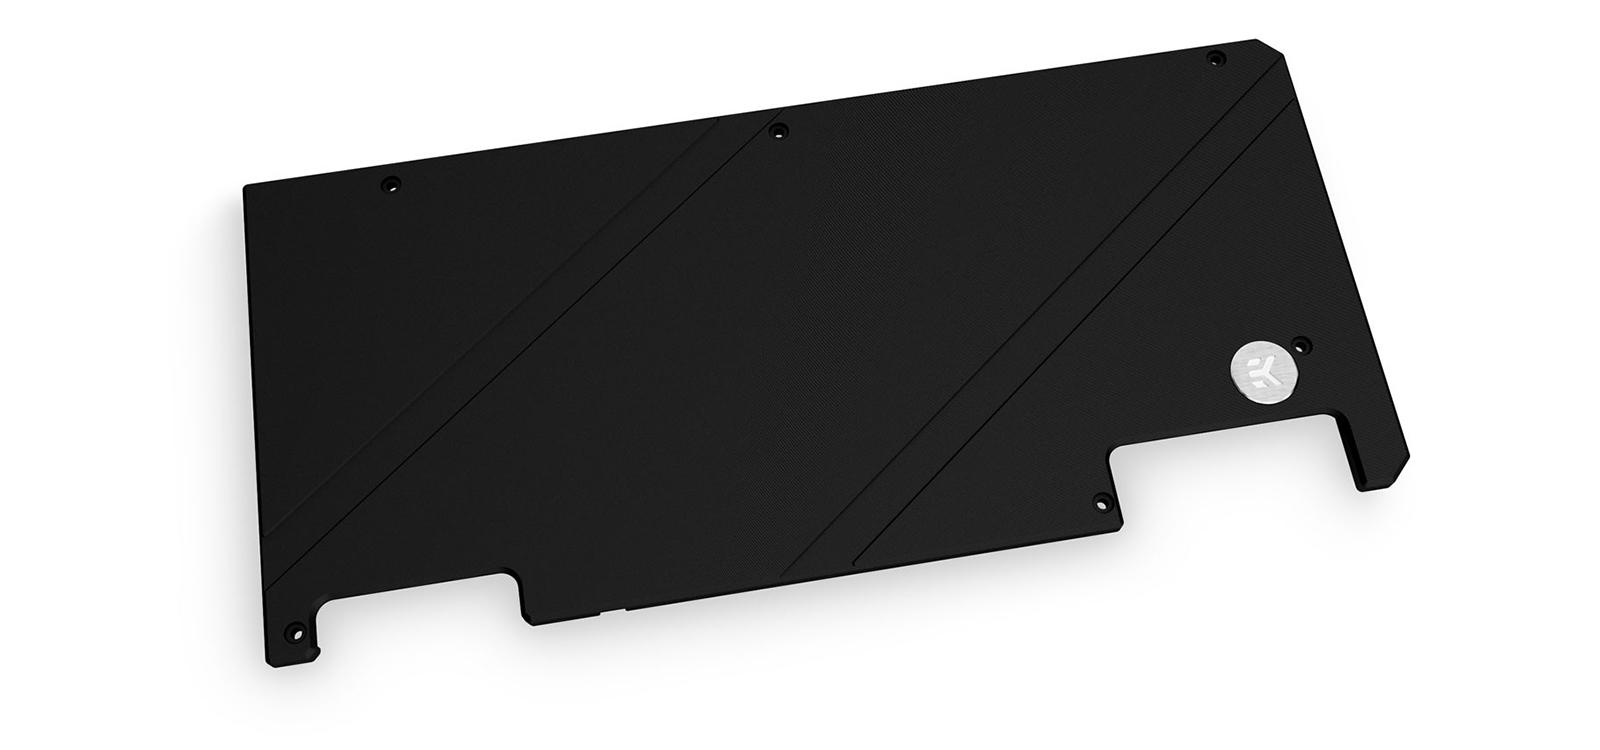 EK-Quantum Vector Strix RTX 3070/3080/3090 Backplate - Black1